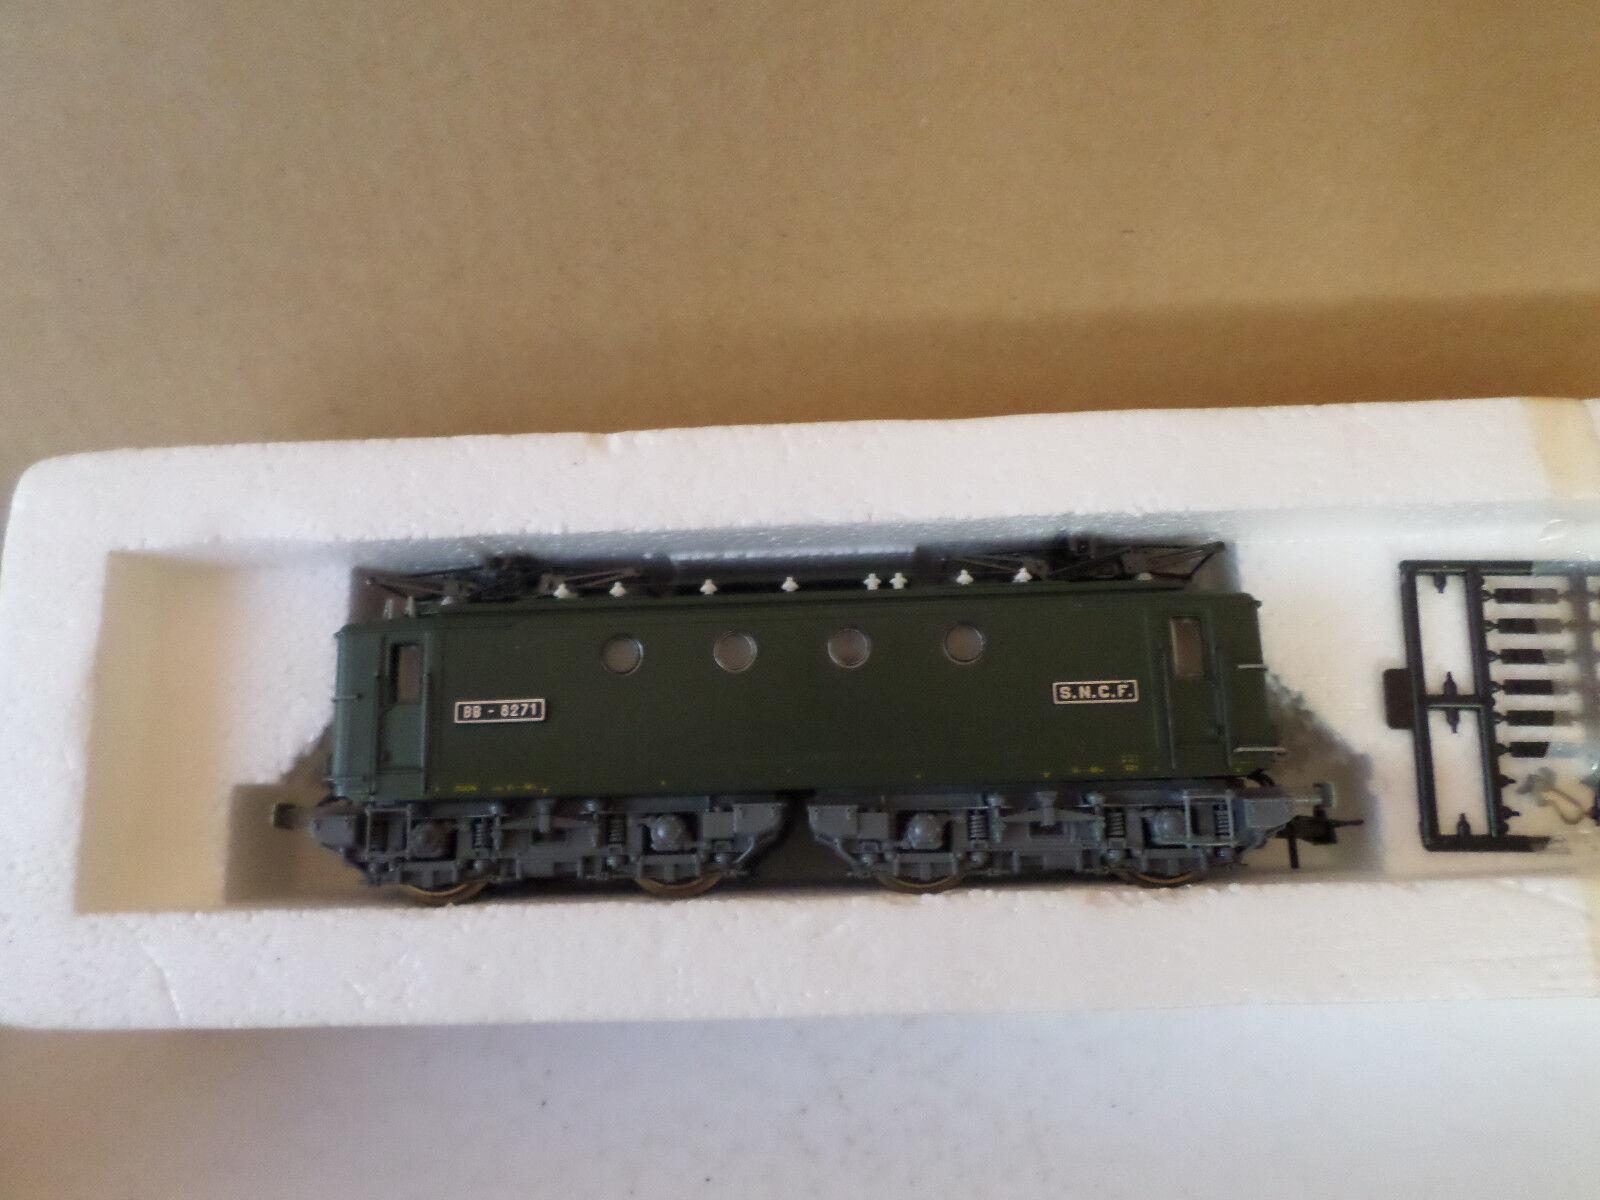 Locomotive roco oh bb 8271 ref 04157 d